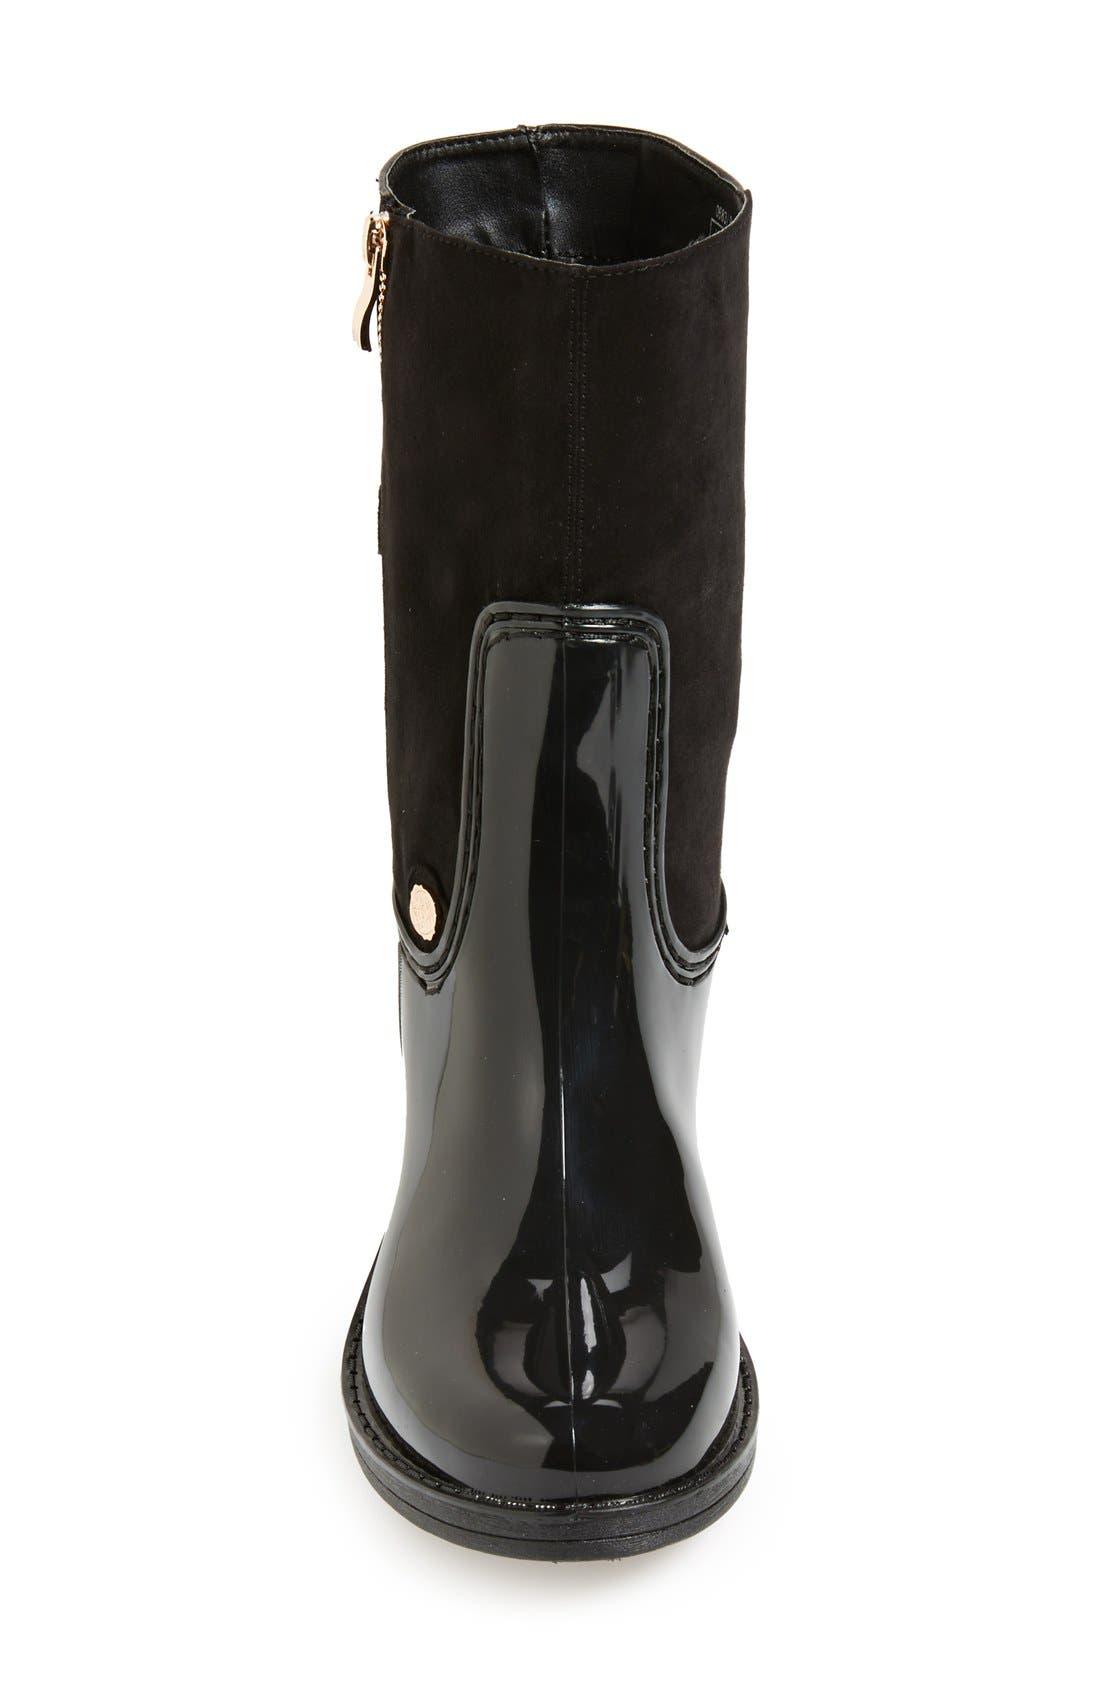 Alternate Image 3  - Posh Wellies 'Resilience' Mid Rain Boot (Women)